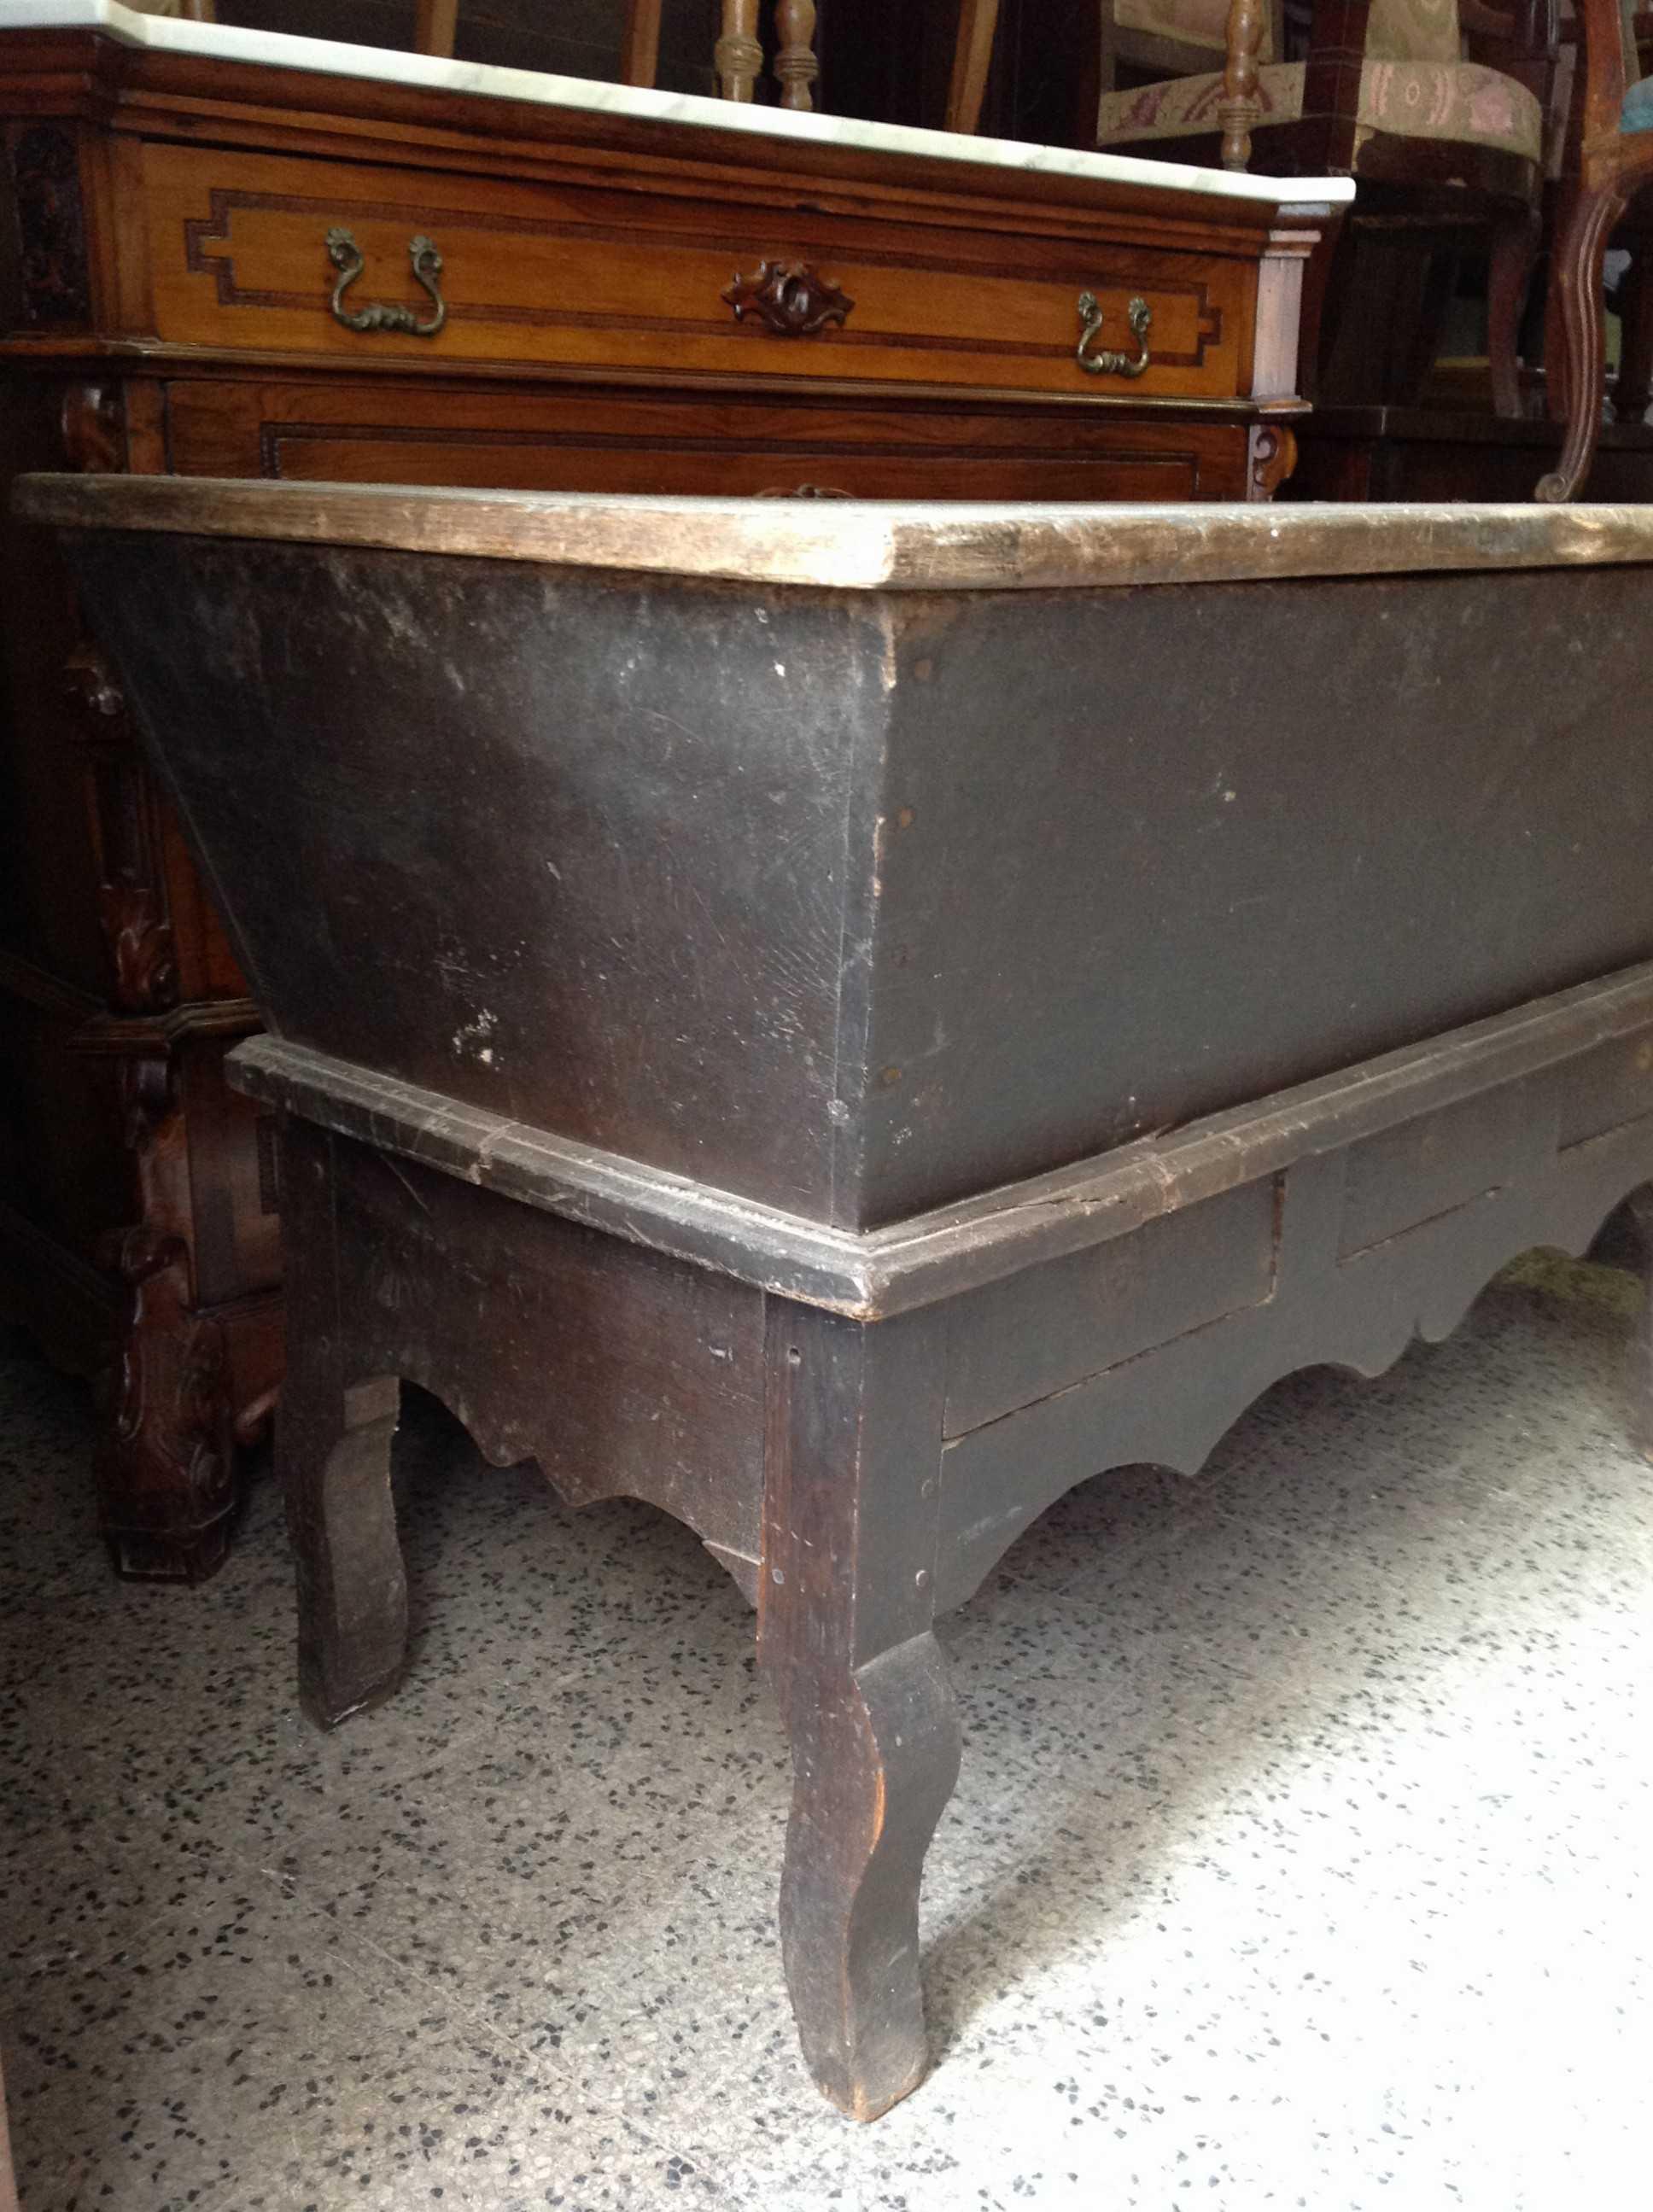 Madia piemonte arredamento mobili antiquariato musetti - Madia mobile antico ...